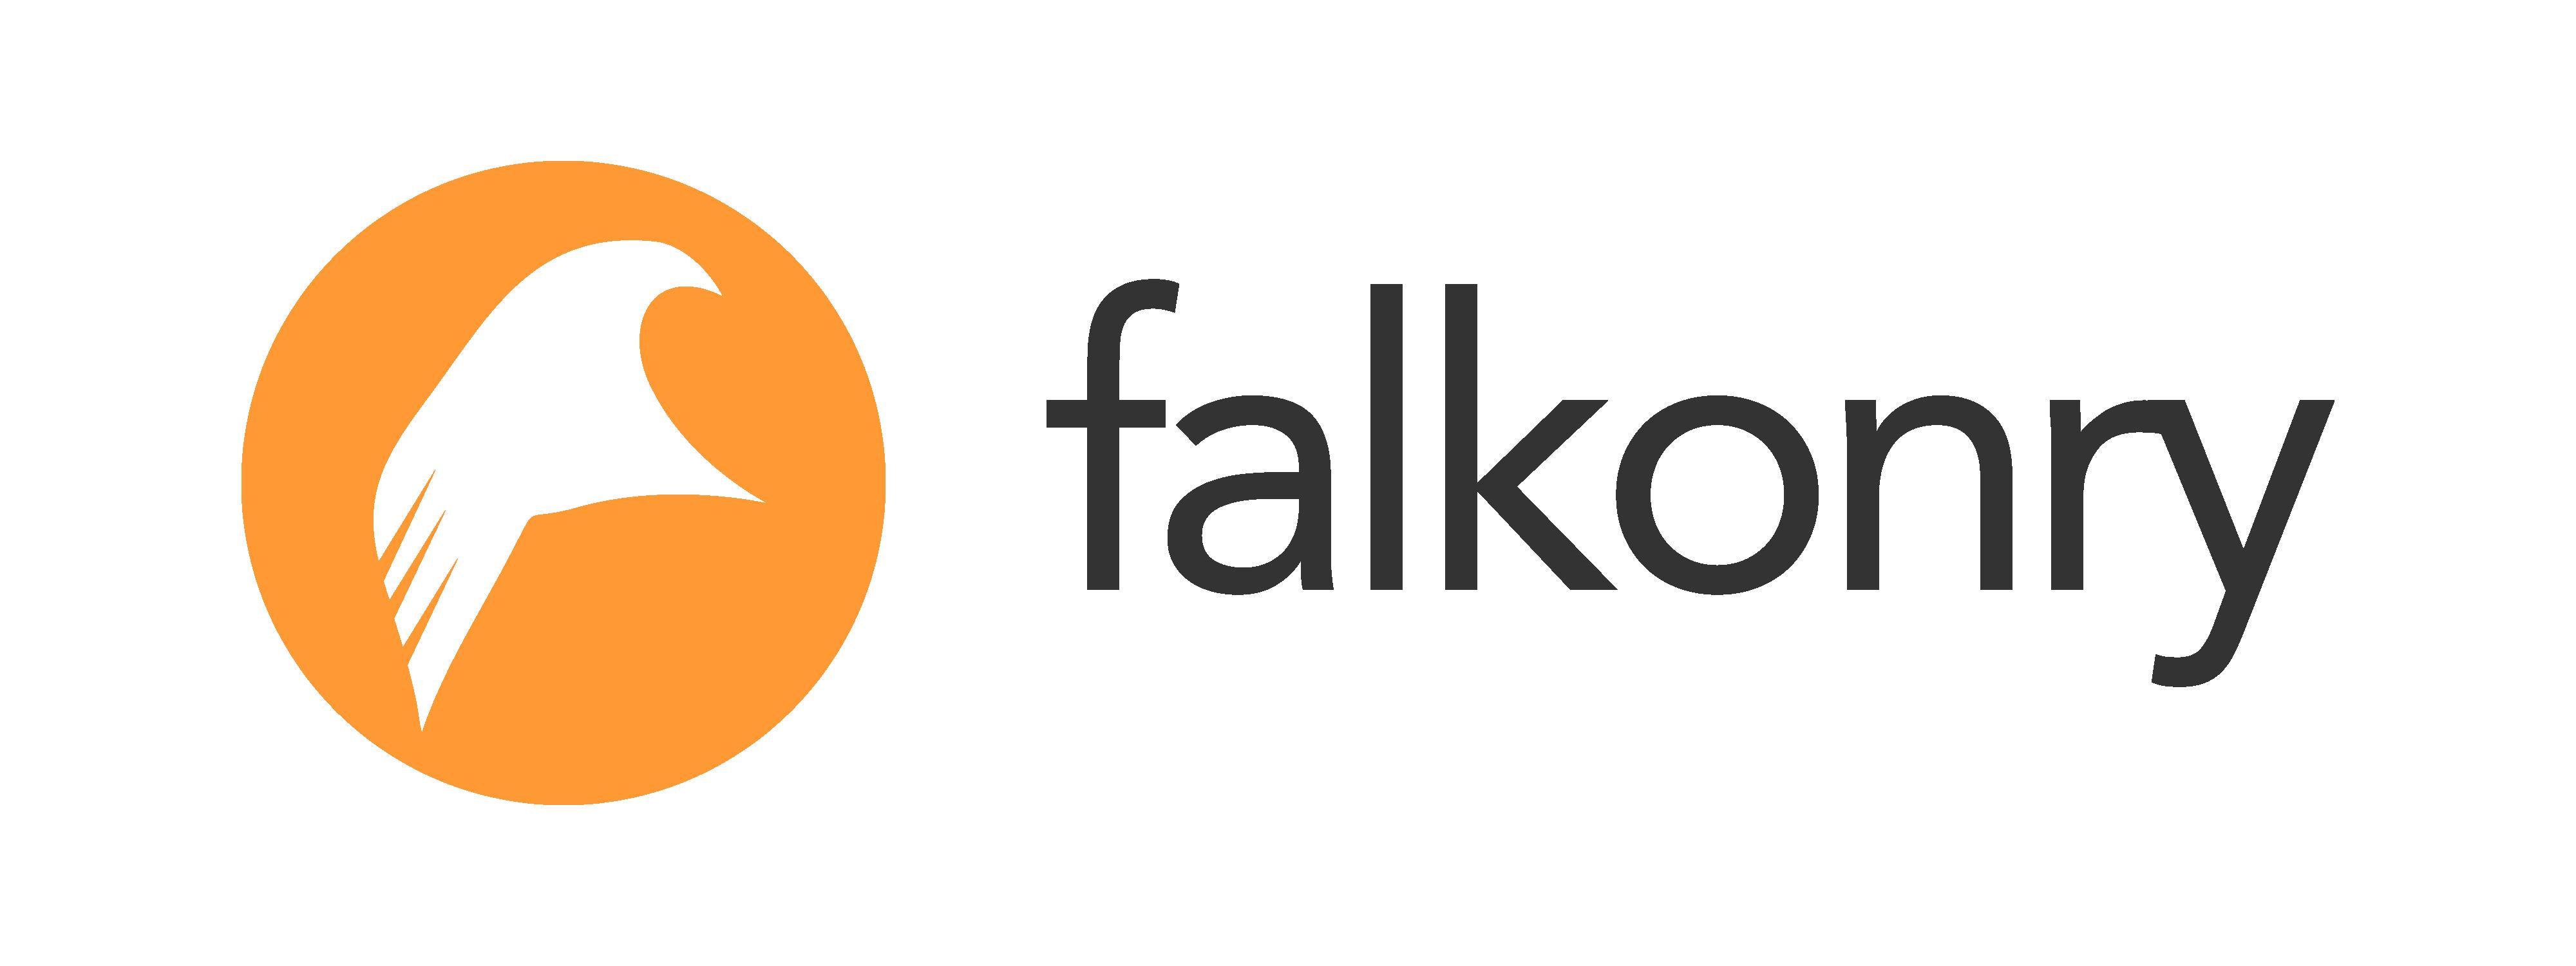 Falkonry_logo